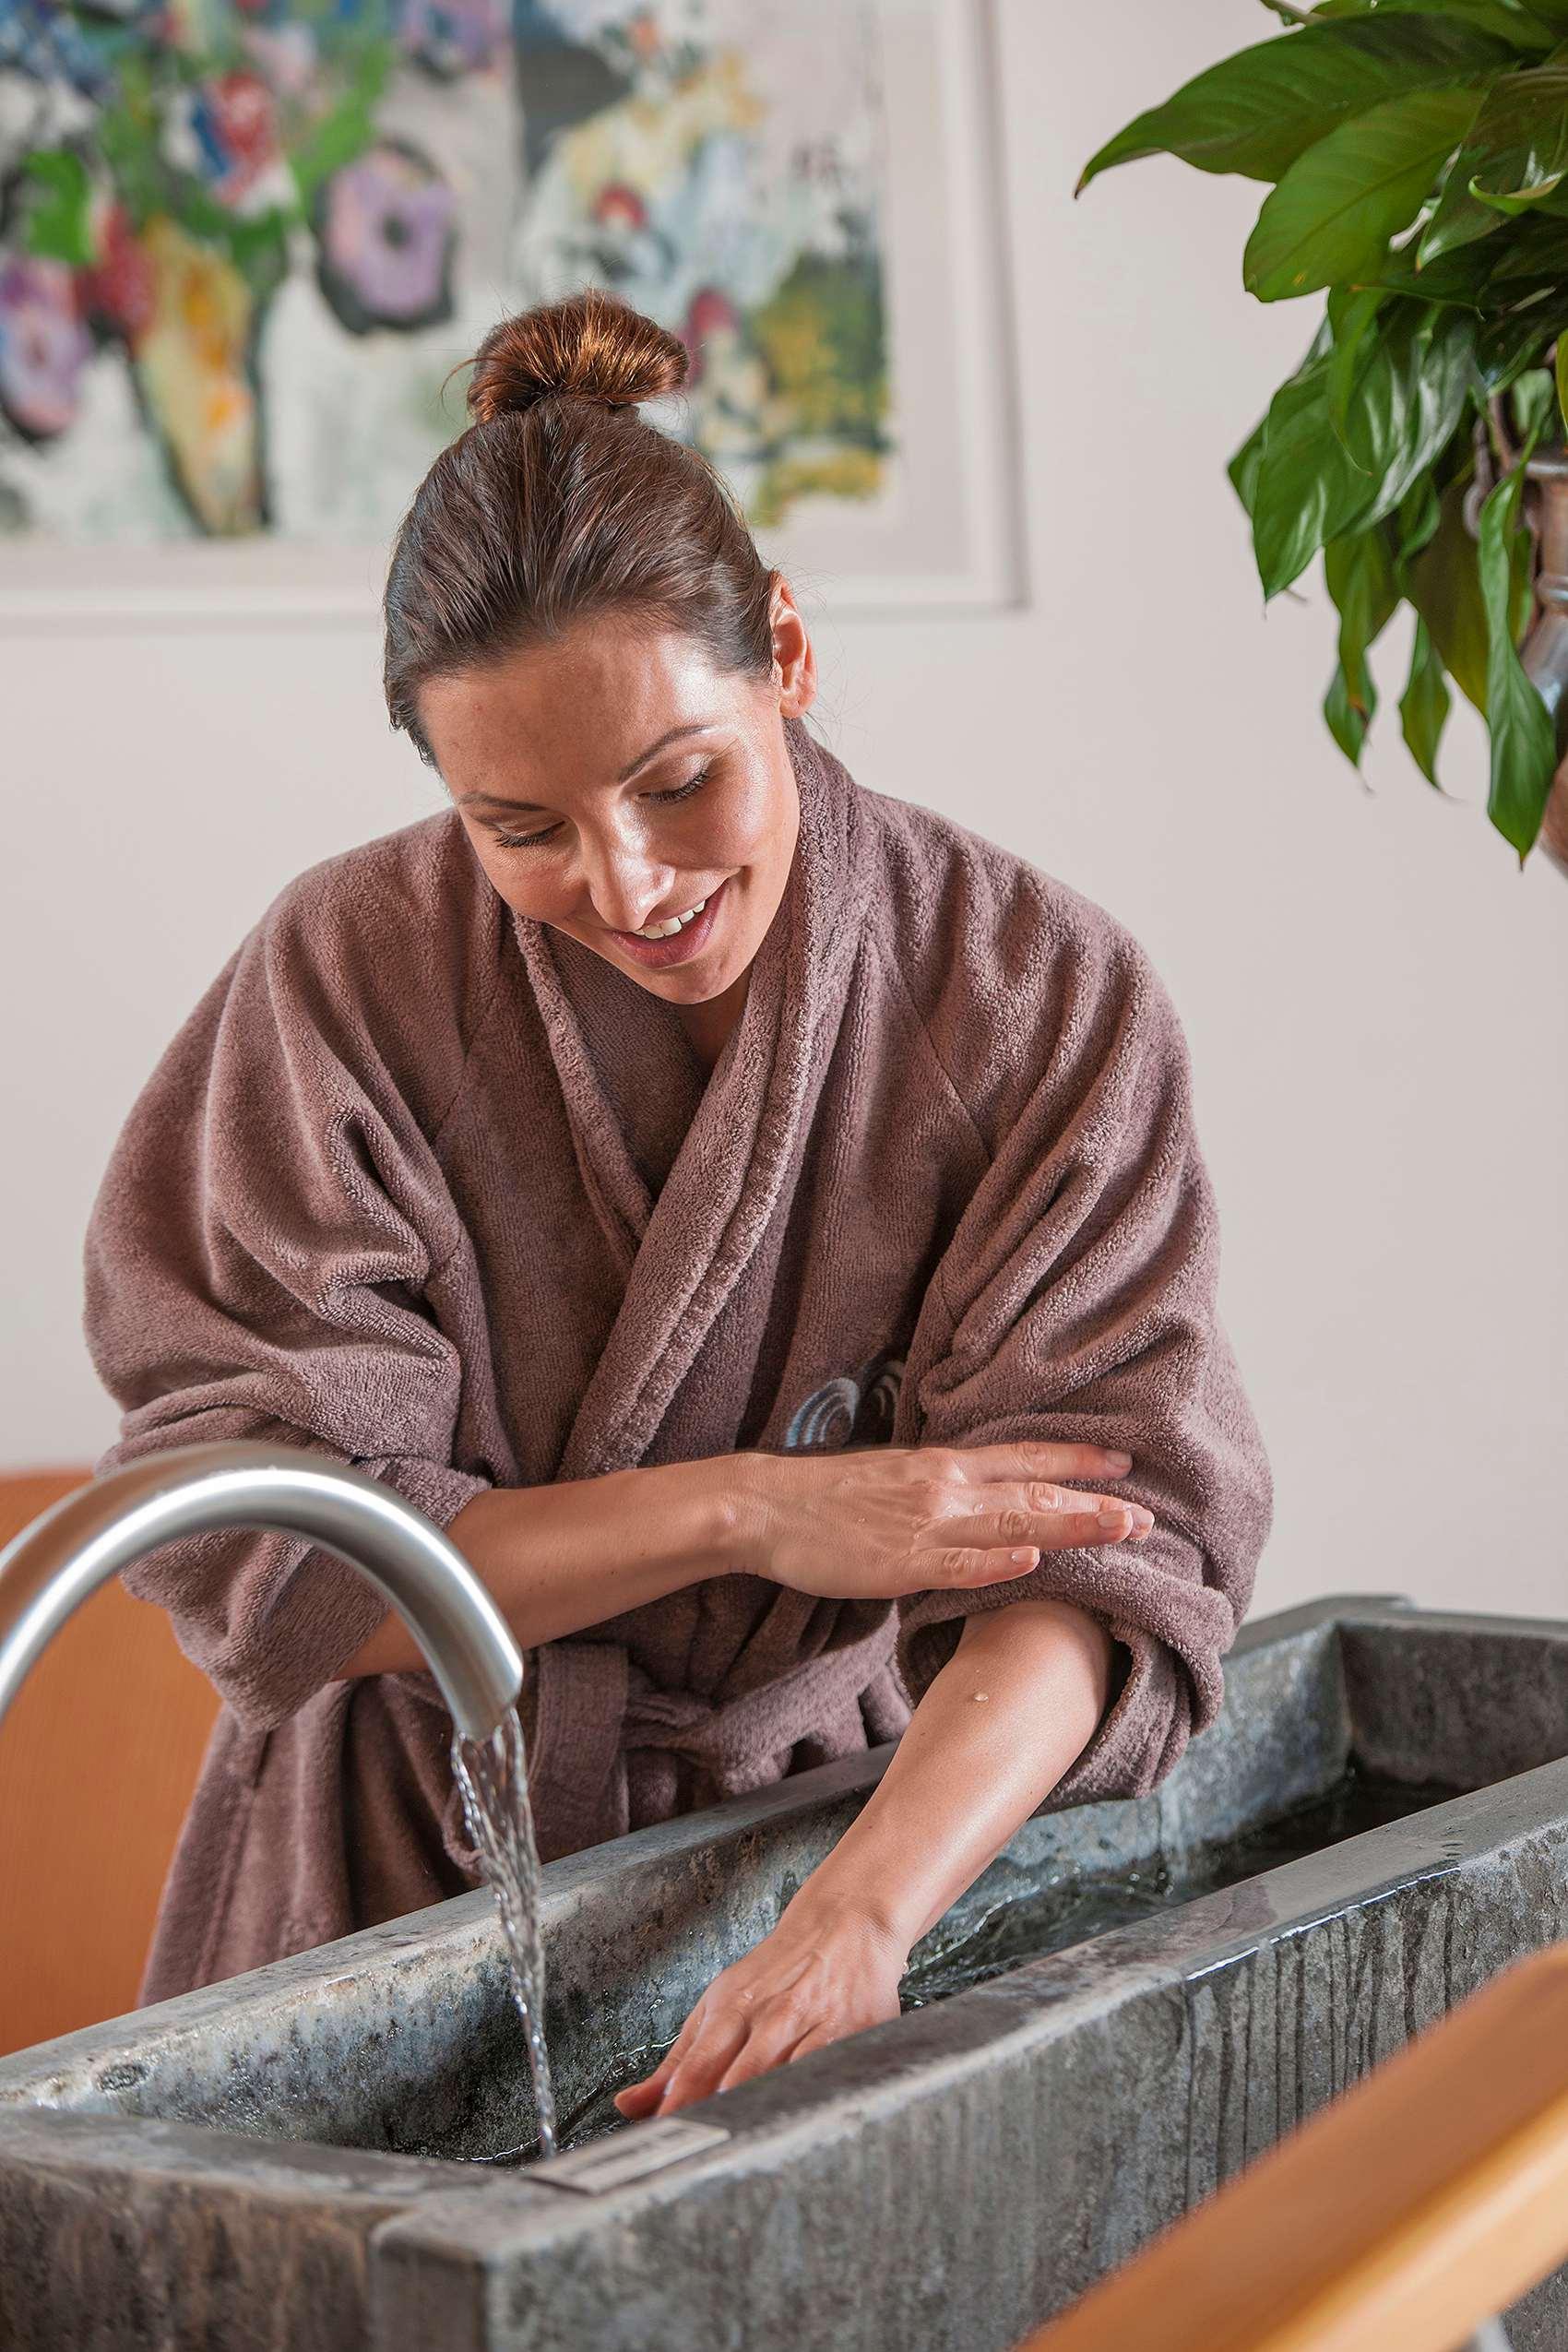 Frau hält Arm in Kneipp-Becken.